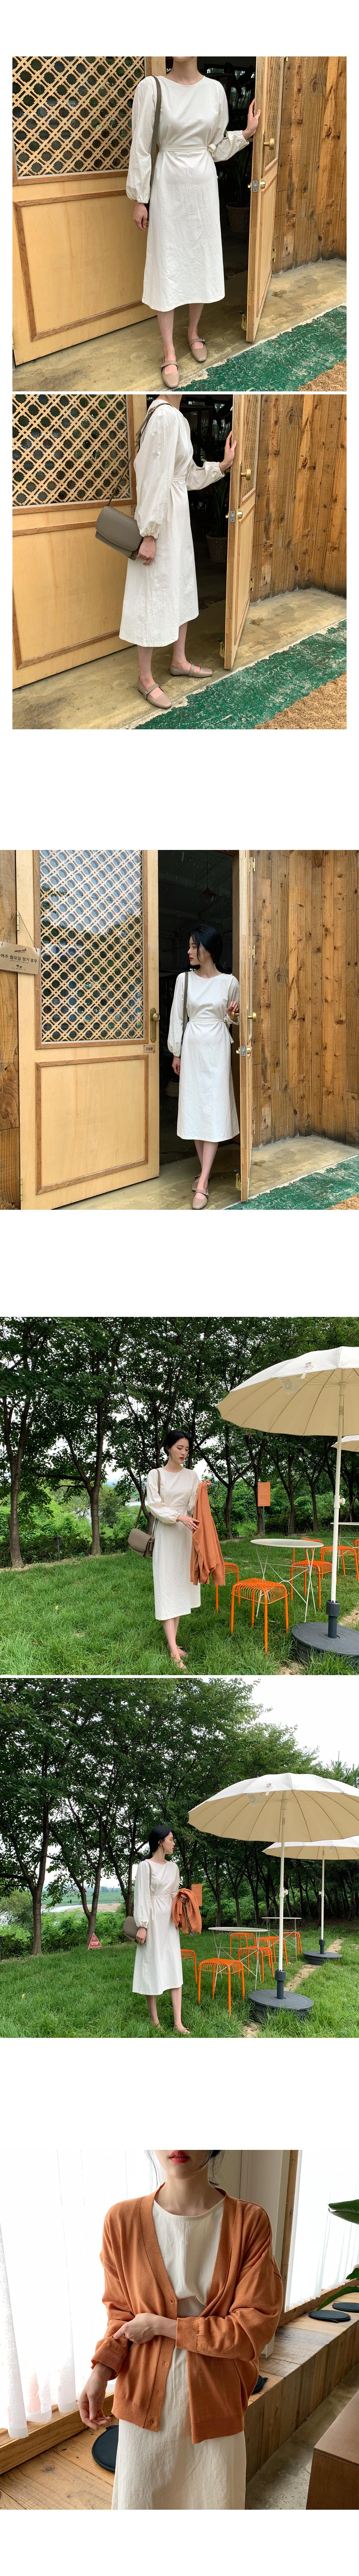 Chase Cotton Long Dress-Pink